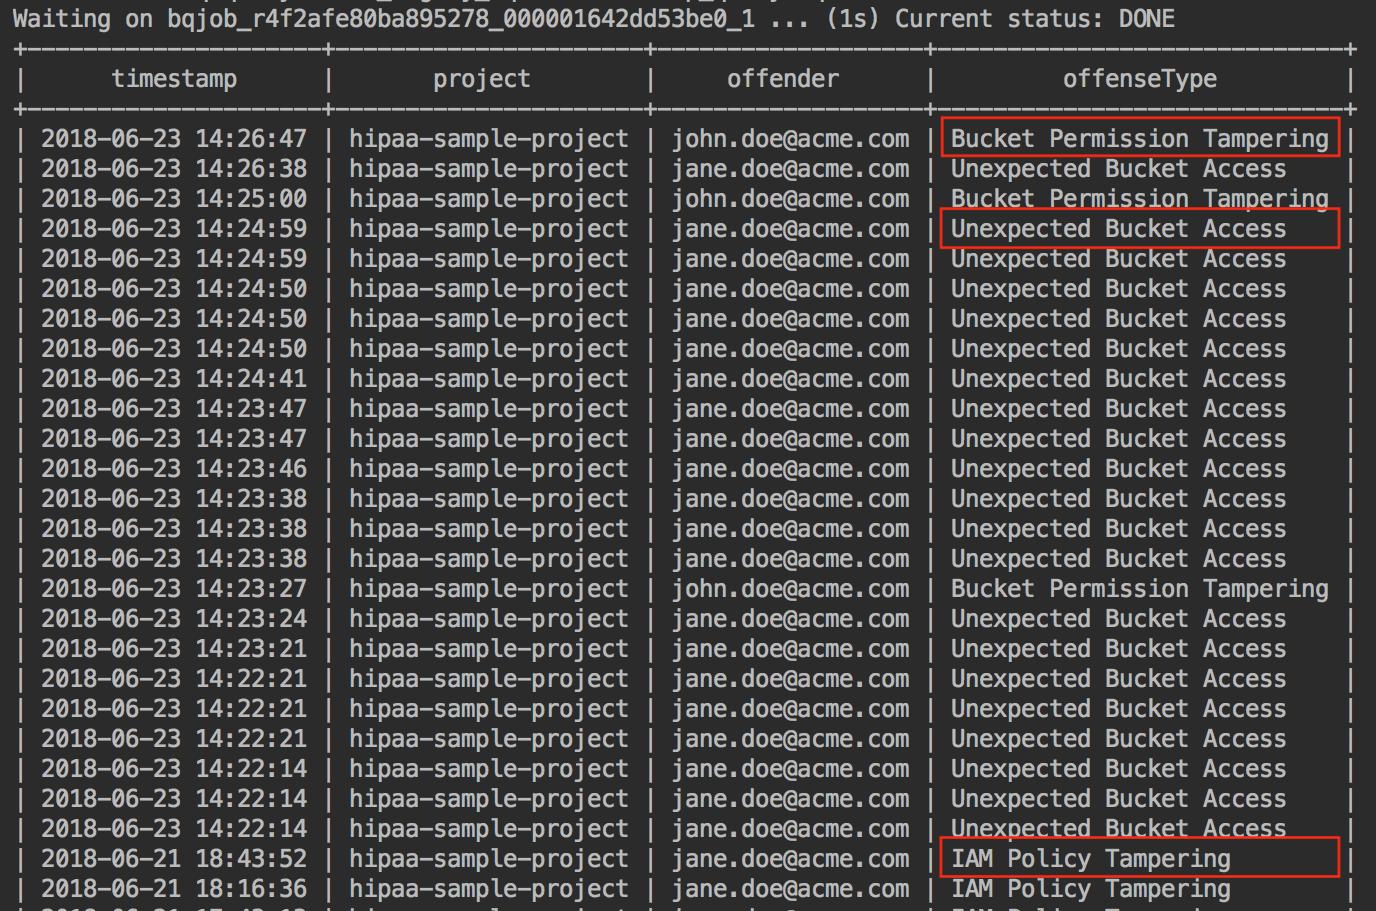 BigQuery 명령줄 인터페이스를 사용하여 쿼리를 실행할 경우 샘플 결과